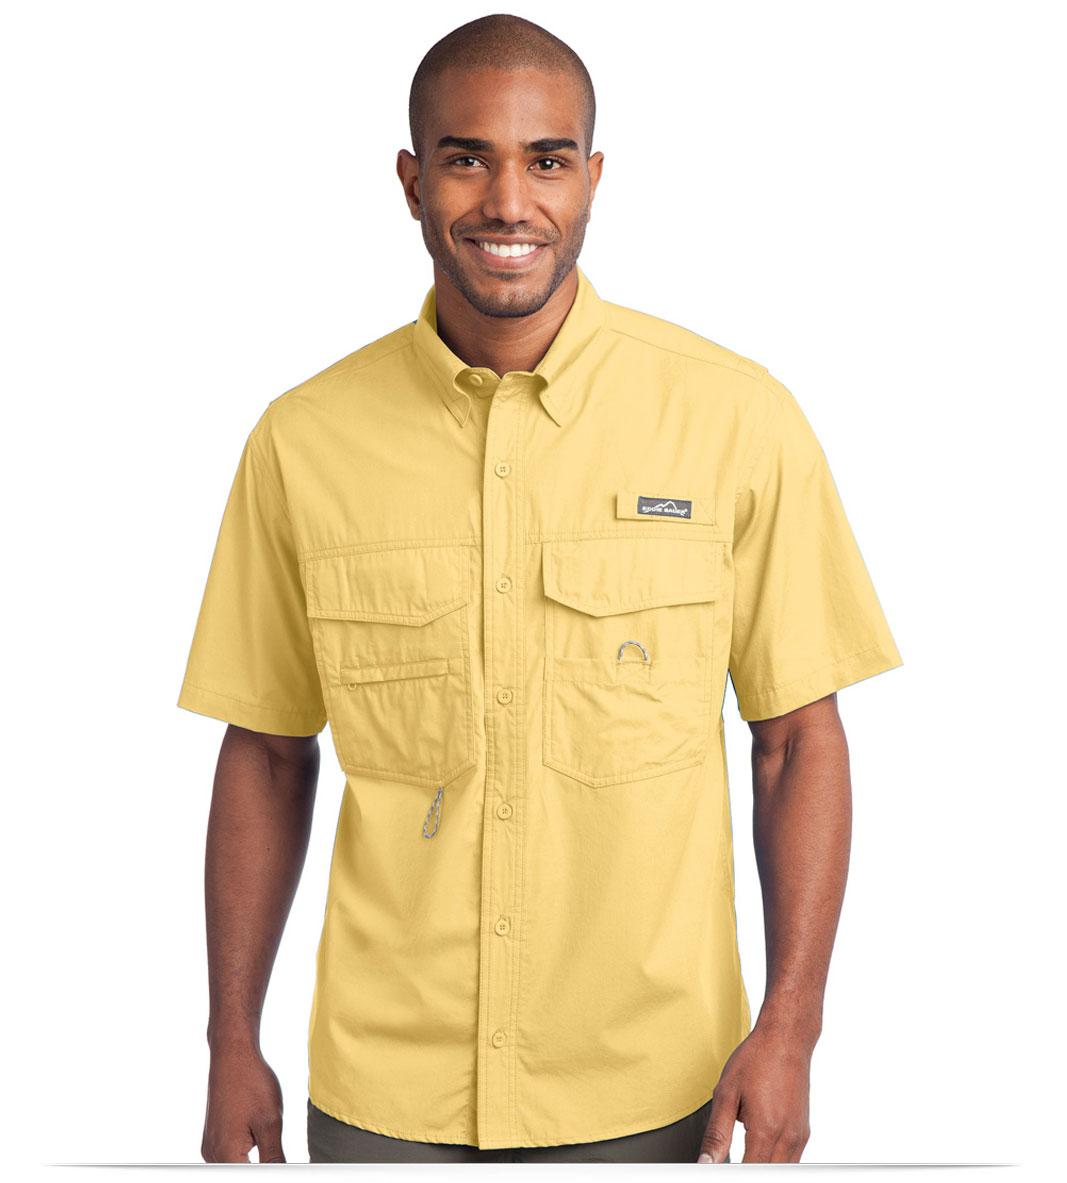 Design embroidered eddie bauer short sleeve fishing shirt for Embroidered work shirts no minimum order